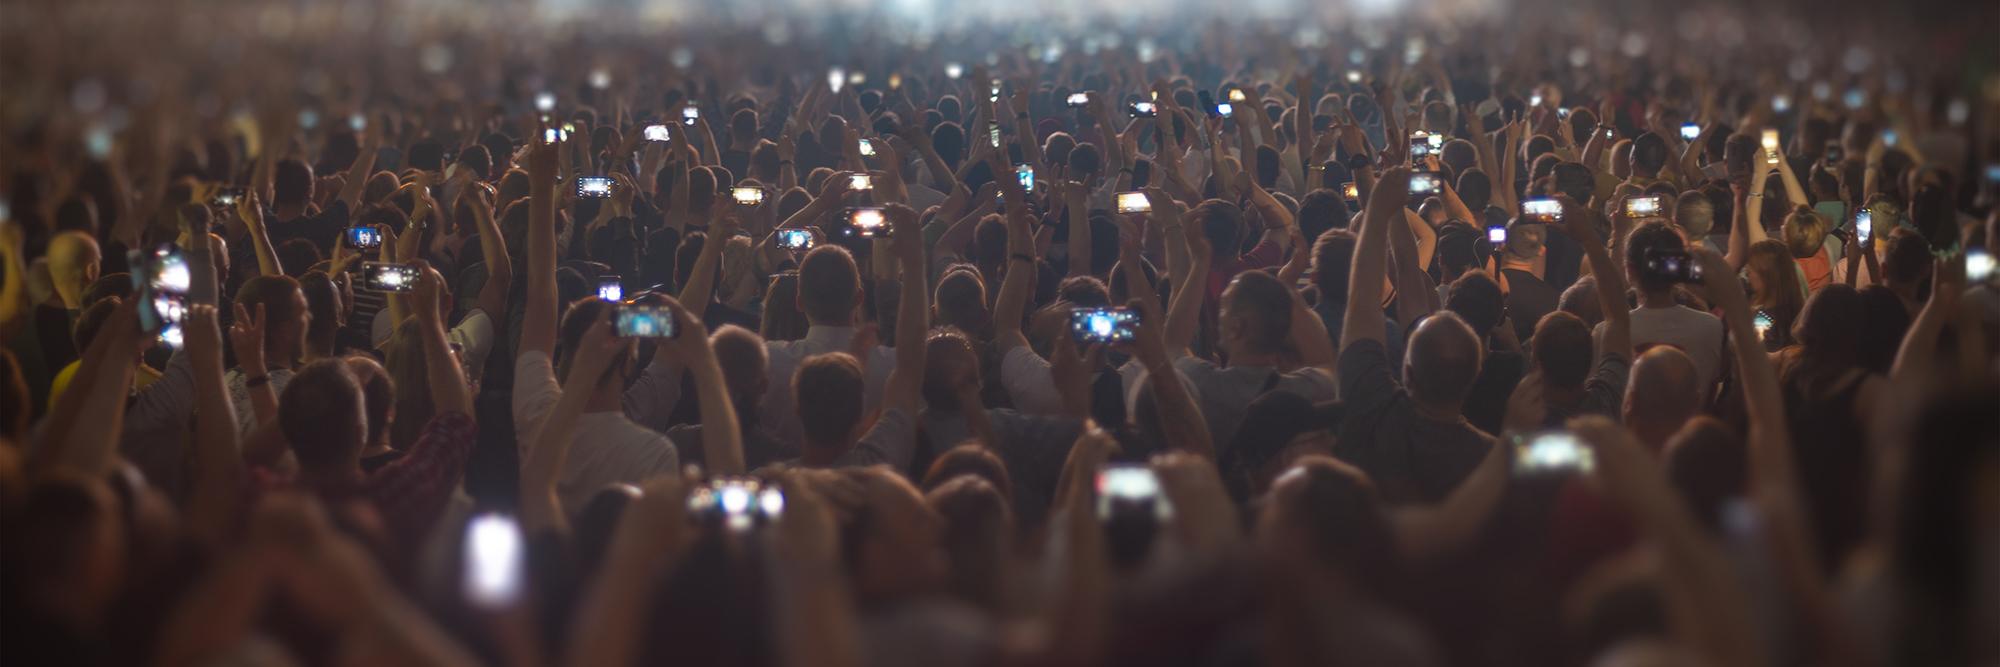 how to market you festival on social media